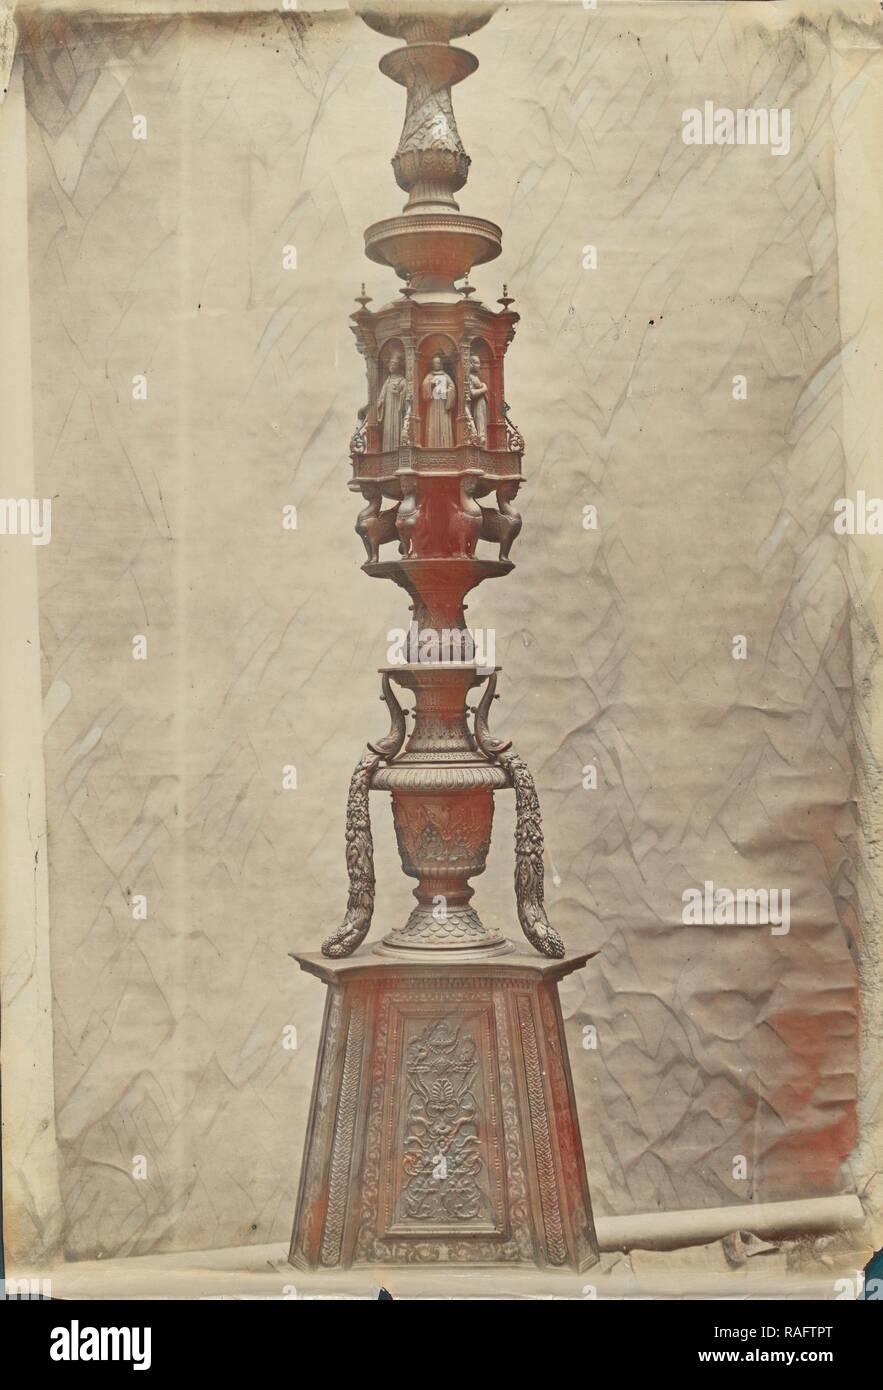 Candelabro en Santa Maria en Organo, Verona, Italia, alrededor de 1865 - 1885, albúmina imprimir plata. Reinventado Imagen De Stock